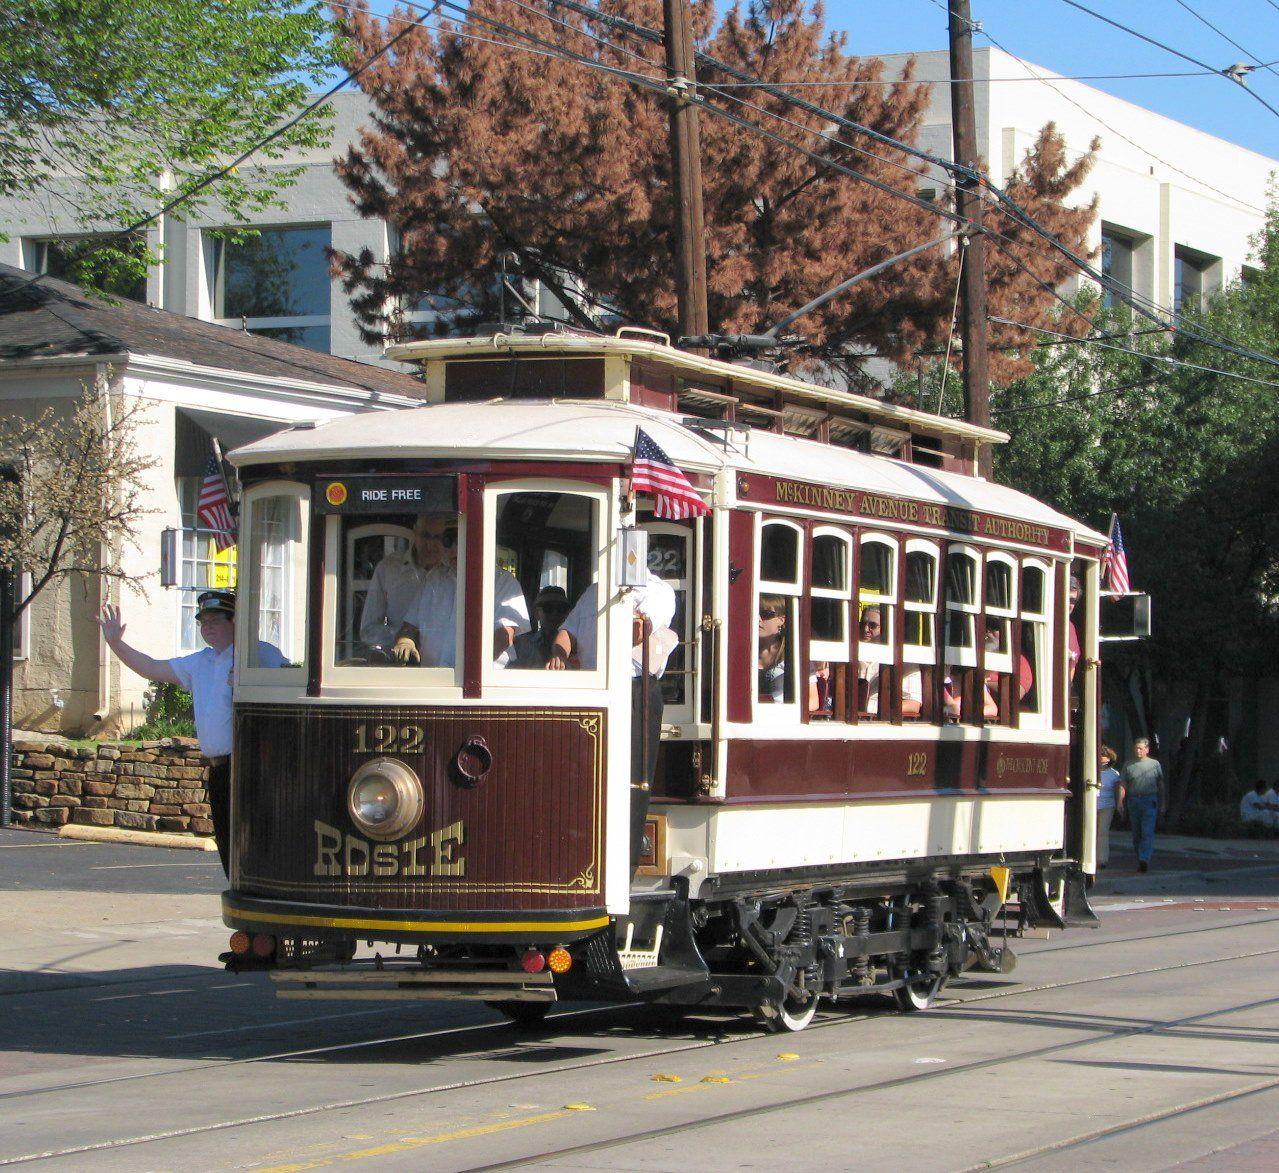 Uptown Dallas Mckinney Avenue Trolley M Line Service Suspension Visit Dallas Dallas Uptown Food Tours